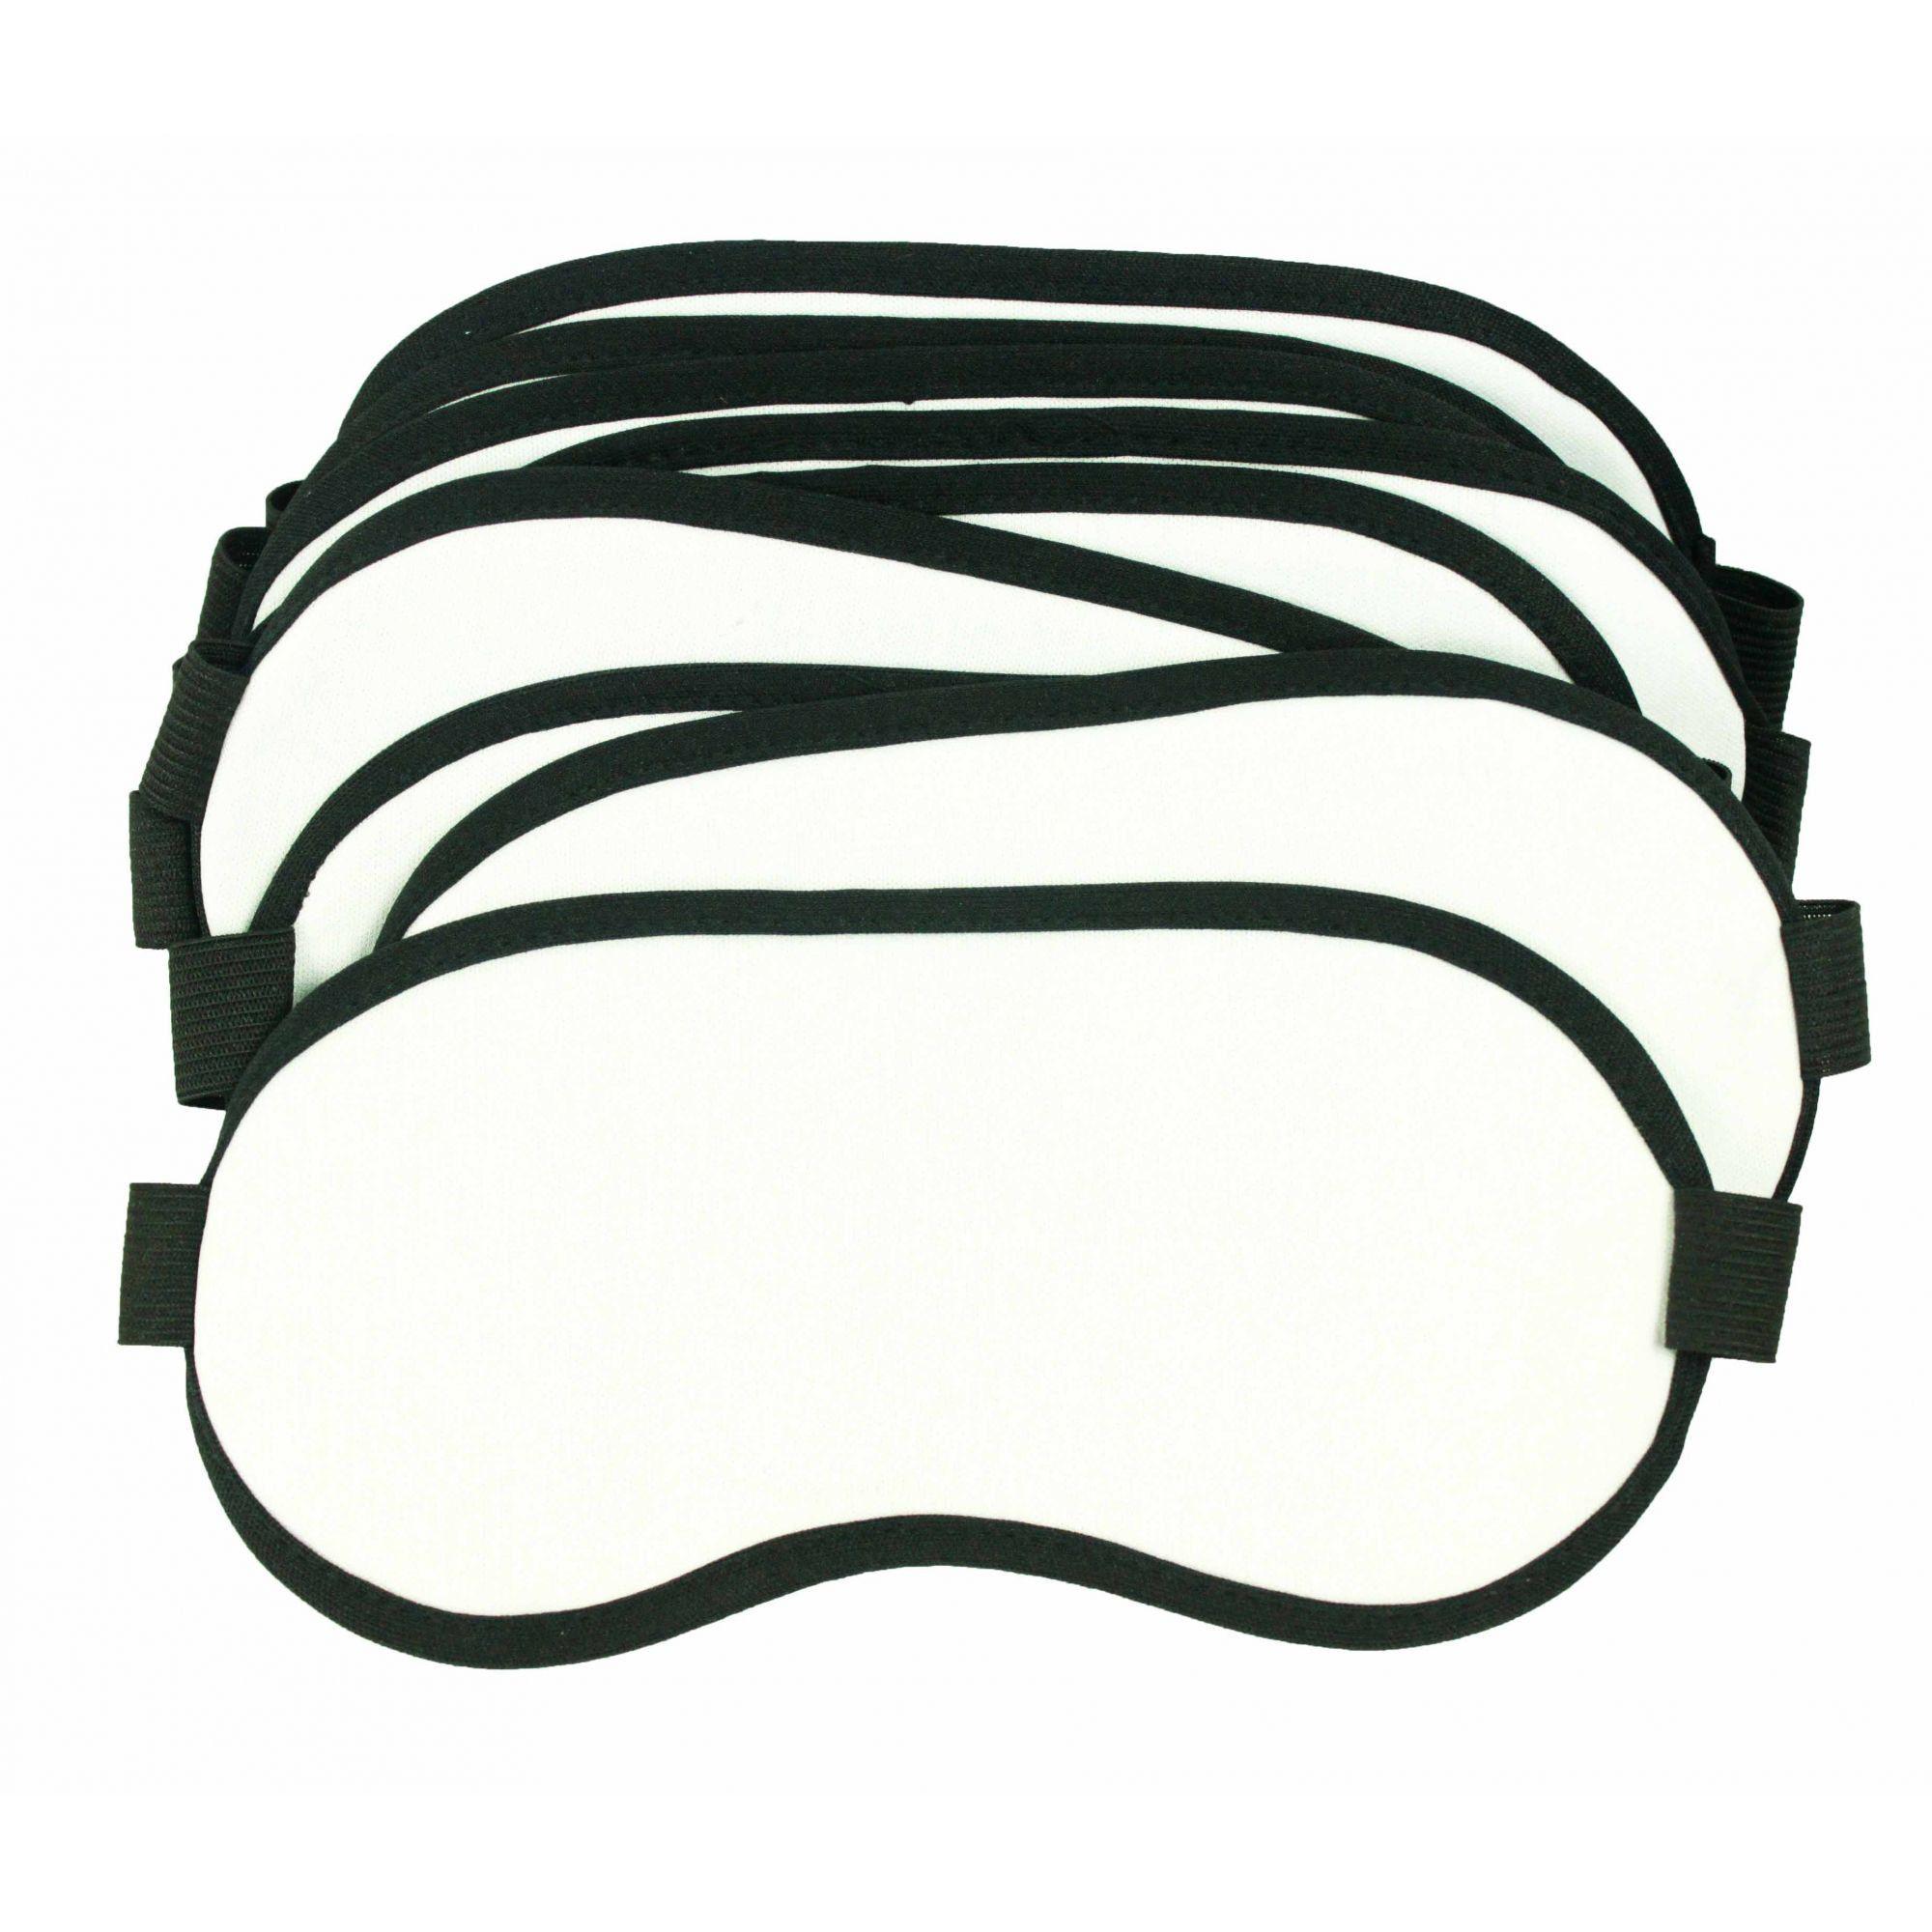 Máscara de Dormir  para sublimação pct 20 unidades